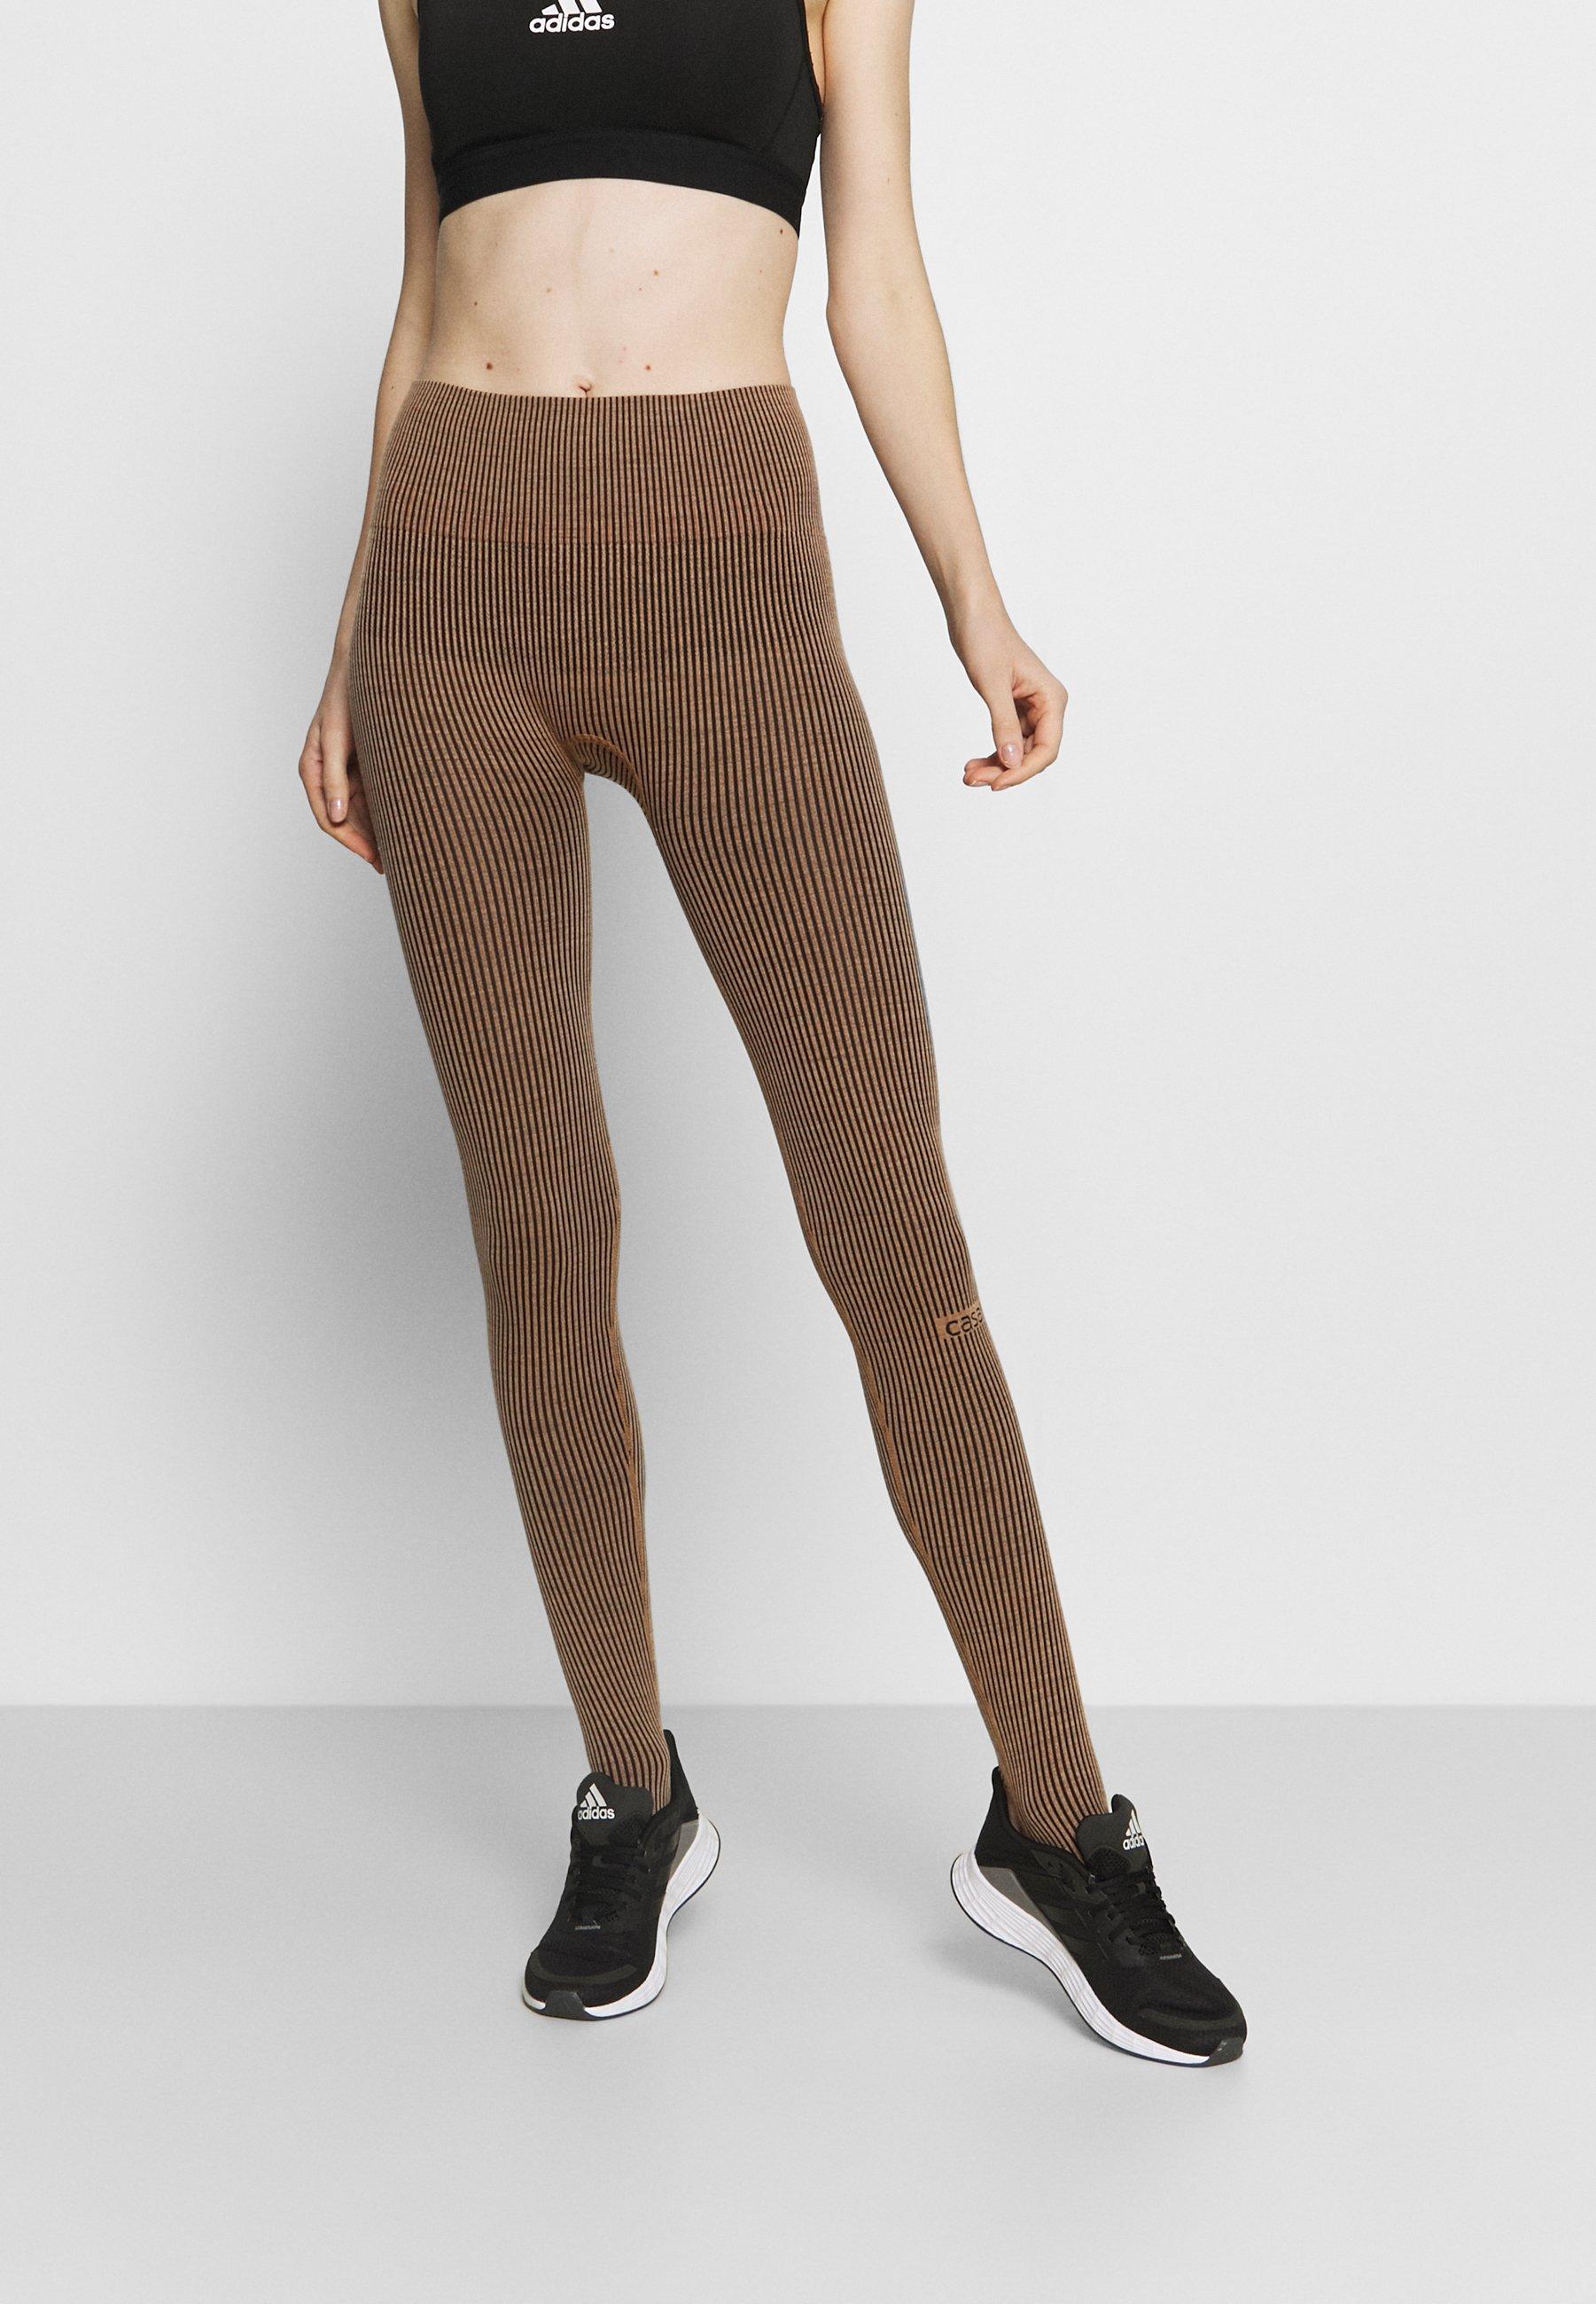 Femme Collants - black/beige